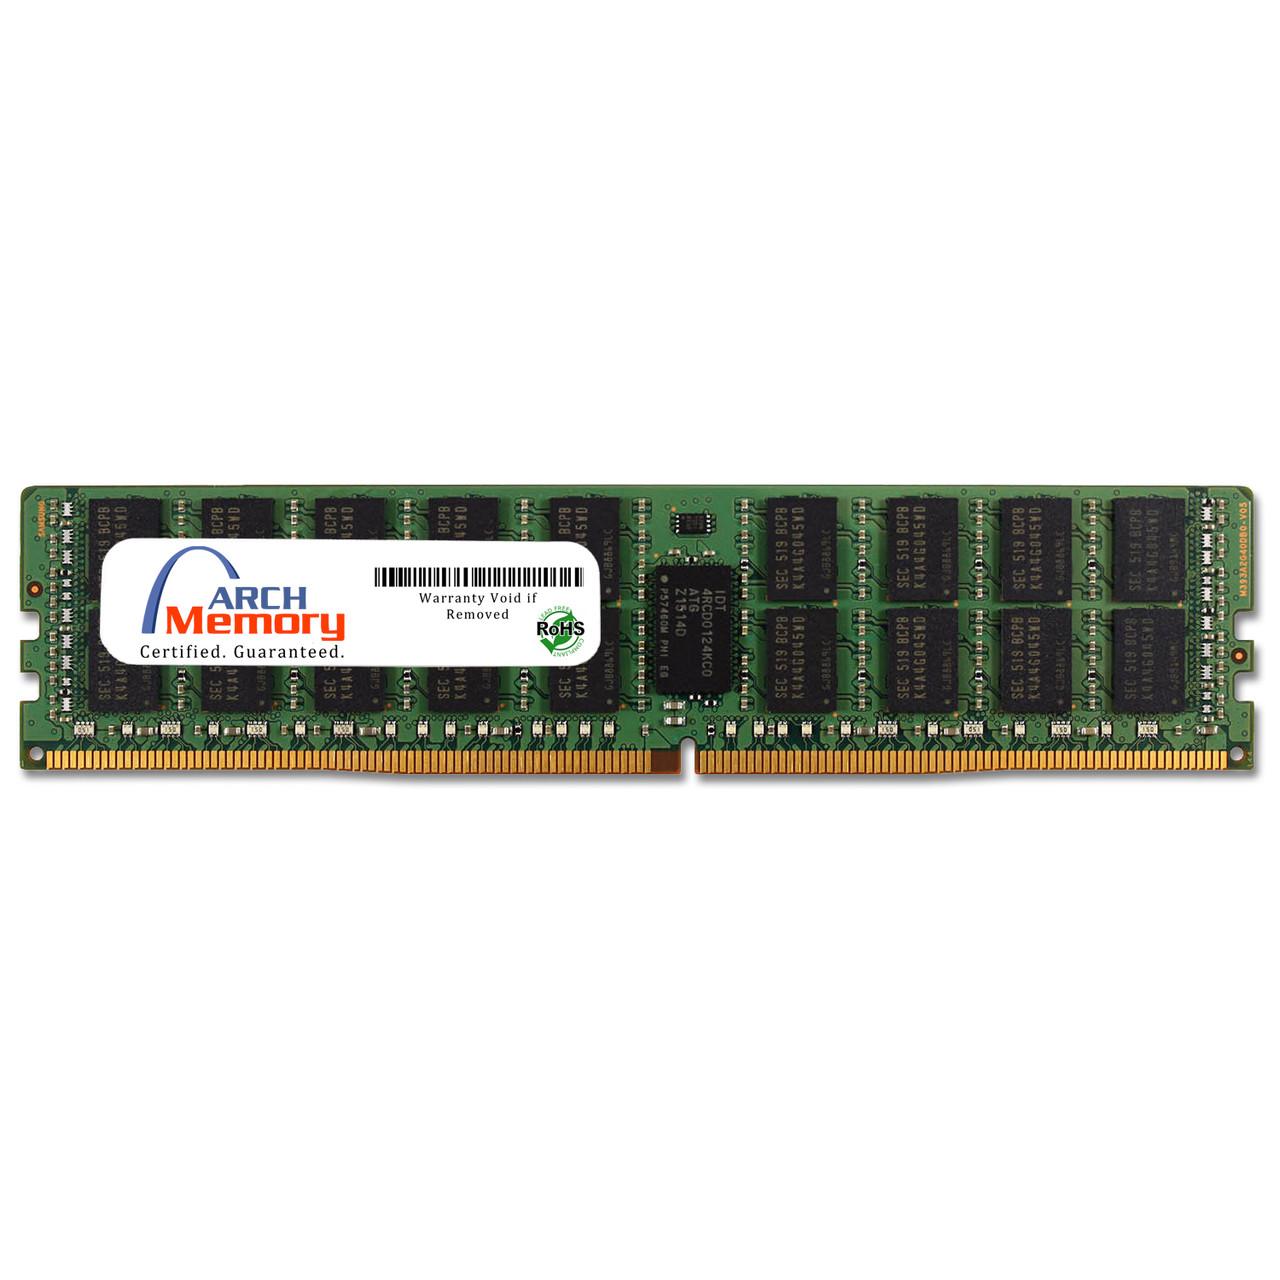 Cisco HX-MR-X64G2RT-H 64 GB 288-Pin DDR4 2933 MHz RDIMM RAM